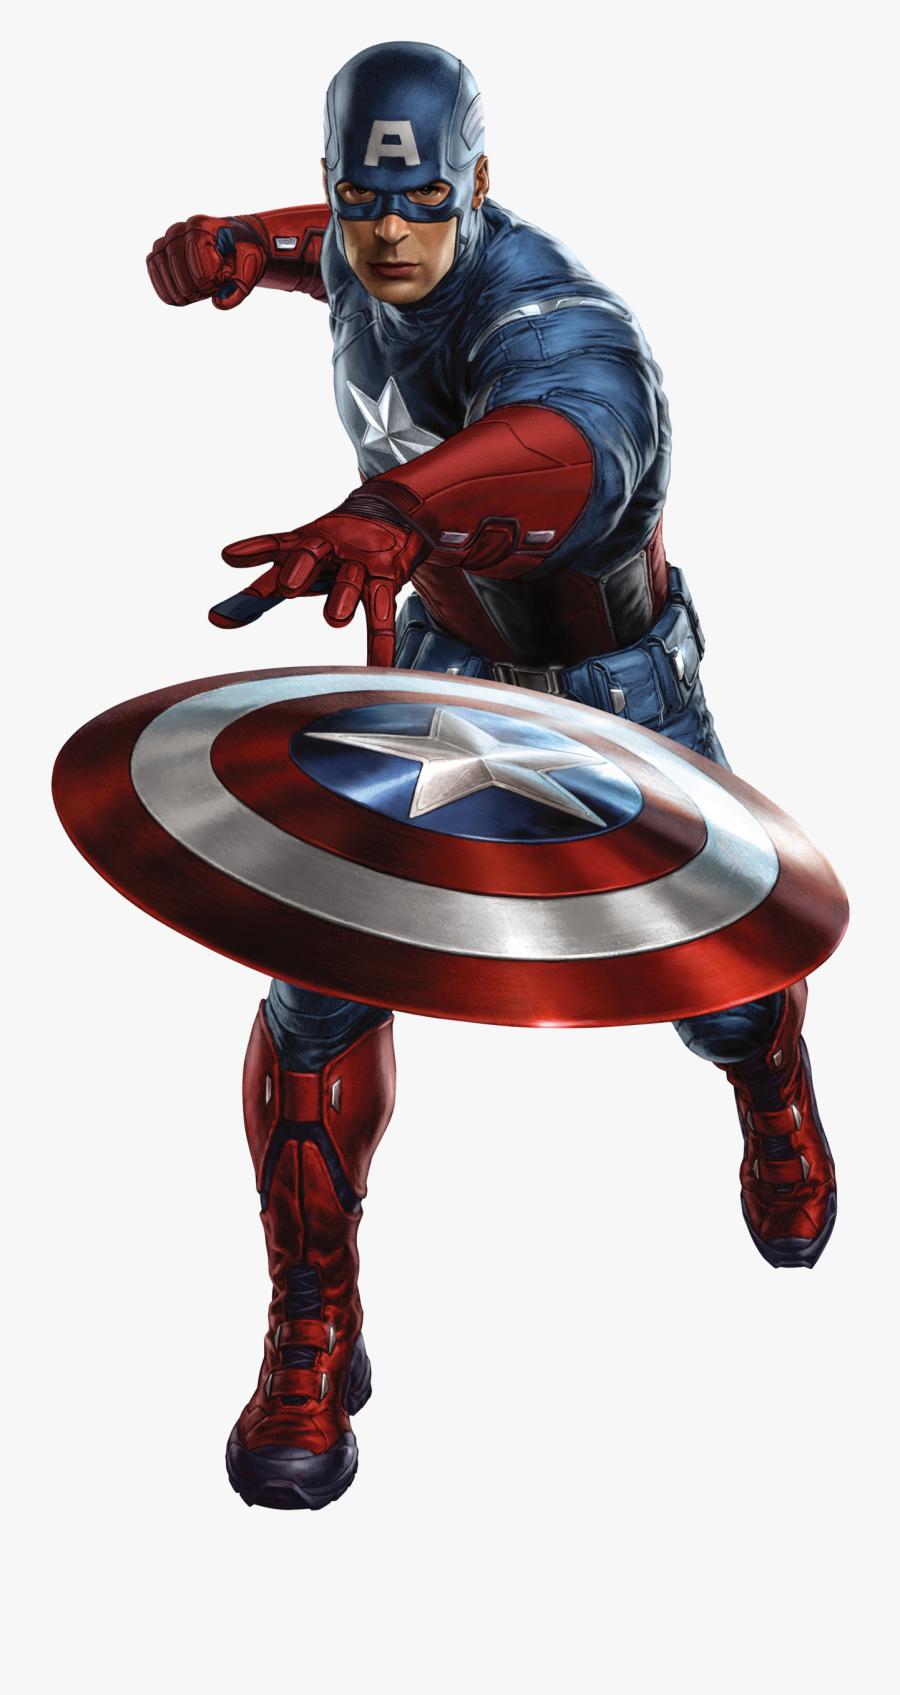 Man America Black Iron The Captain Avengers Clipart - Capitan America En Png, Transparent Clipart